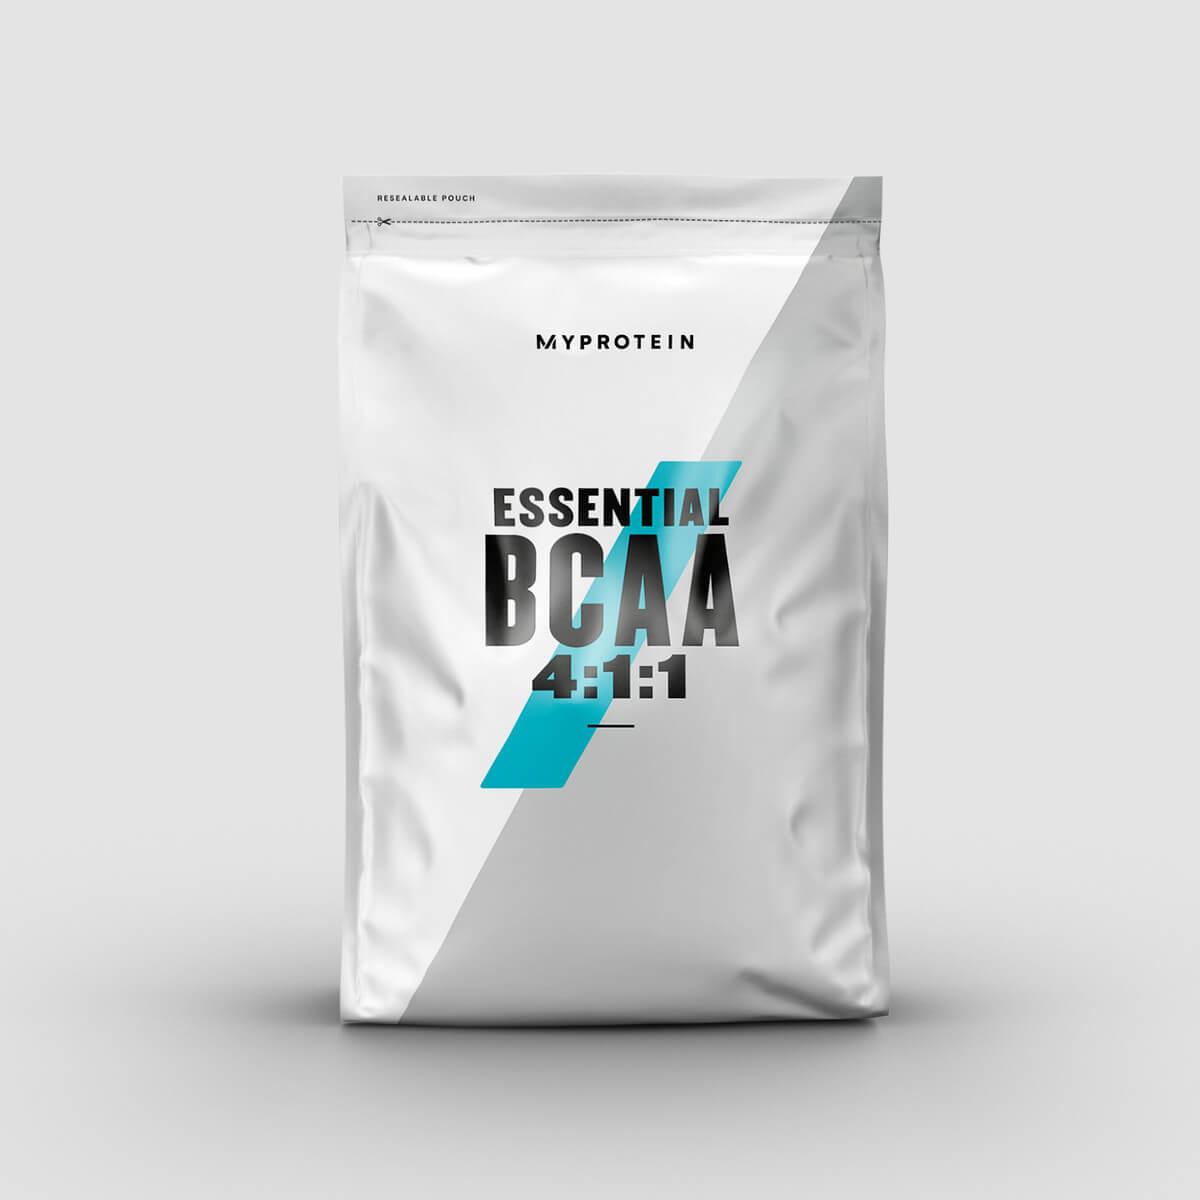 Myprotein Essential BCAA 4:1:1 Powder - 500g - Tropical